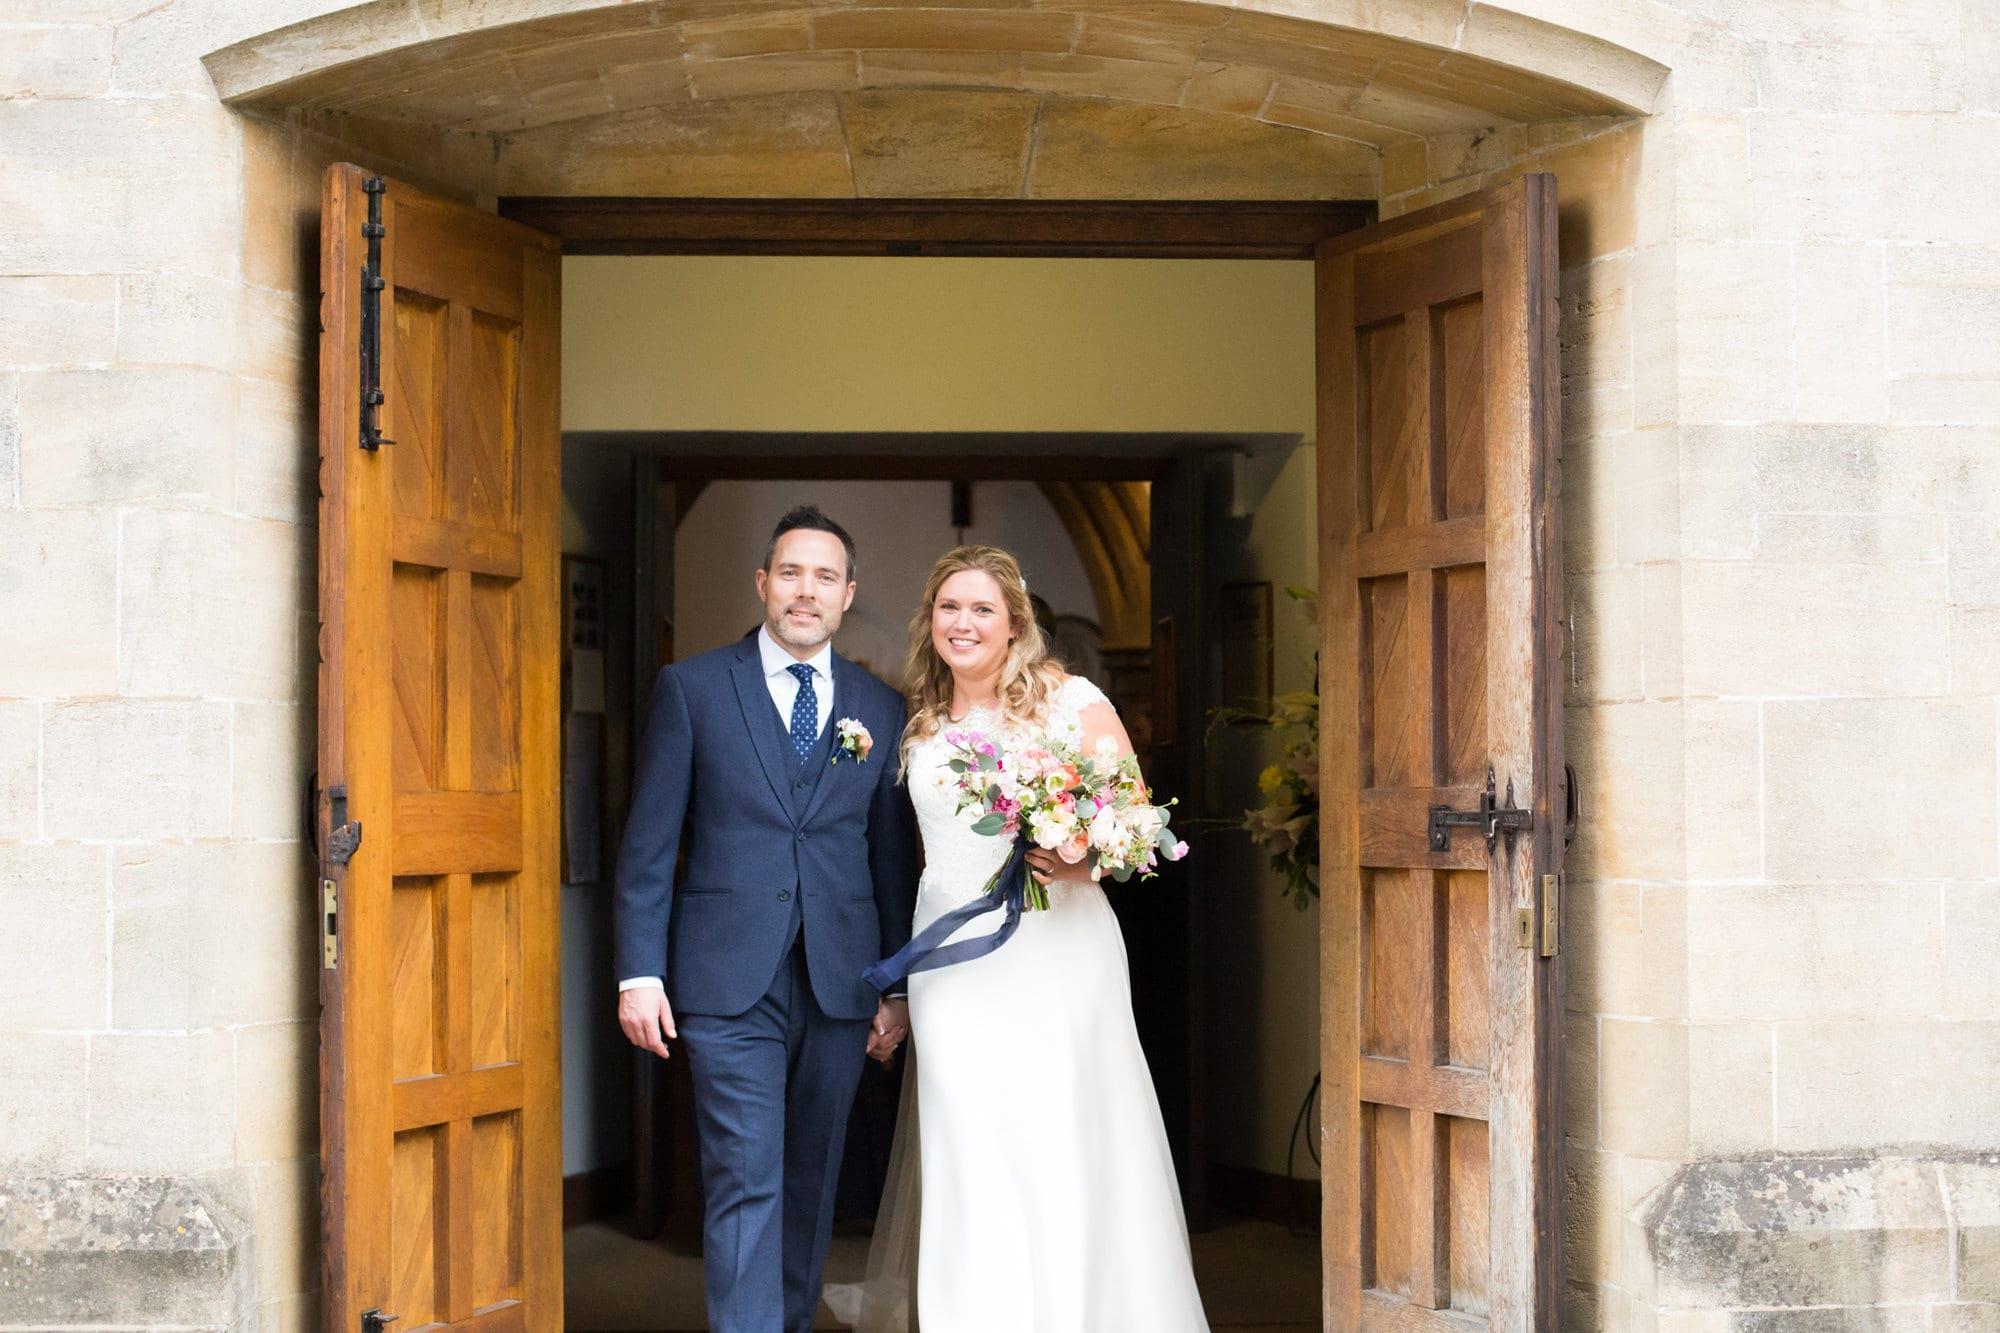 Couple just married standing in church doorway in wedding photo in Bromley, Kent